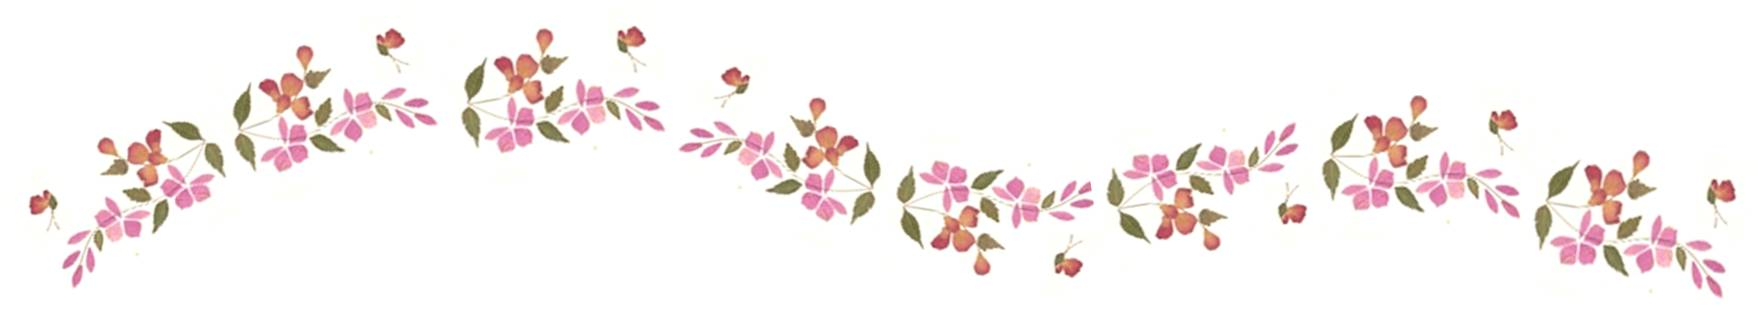 bloemenslinger[1]